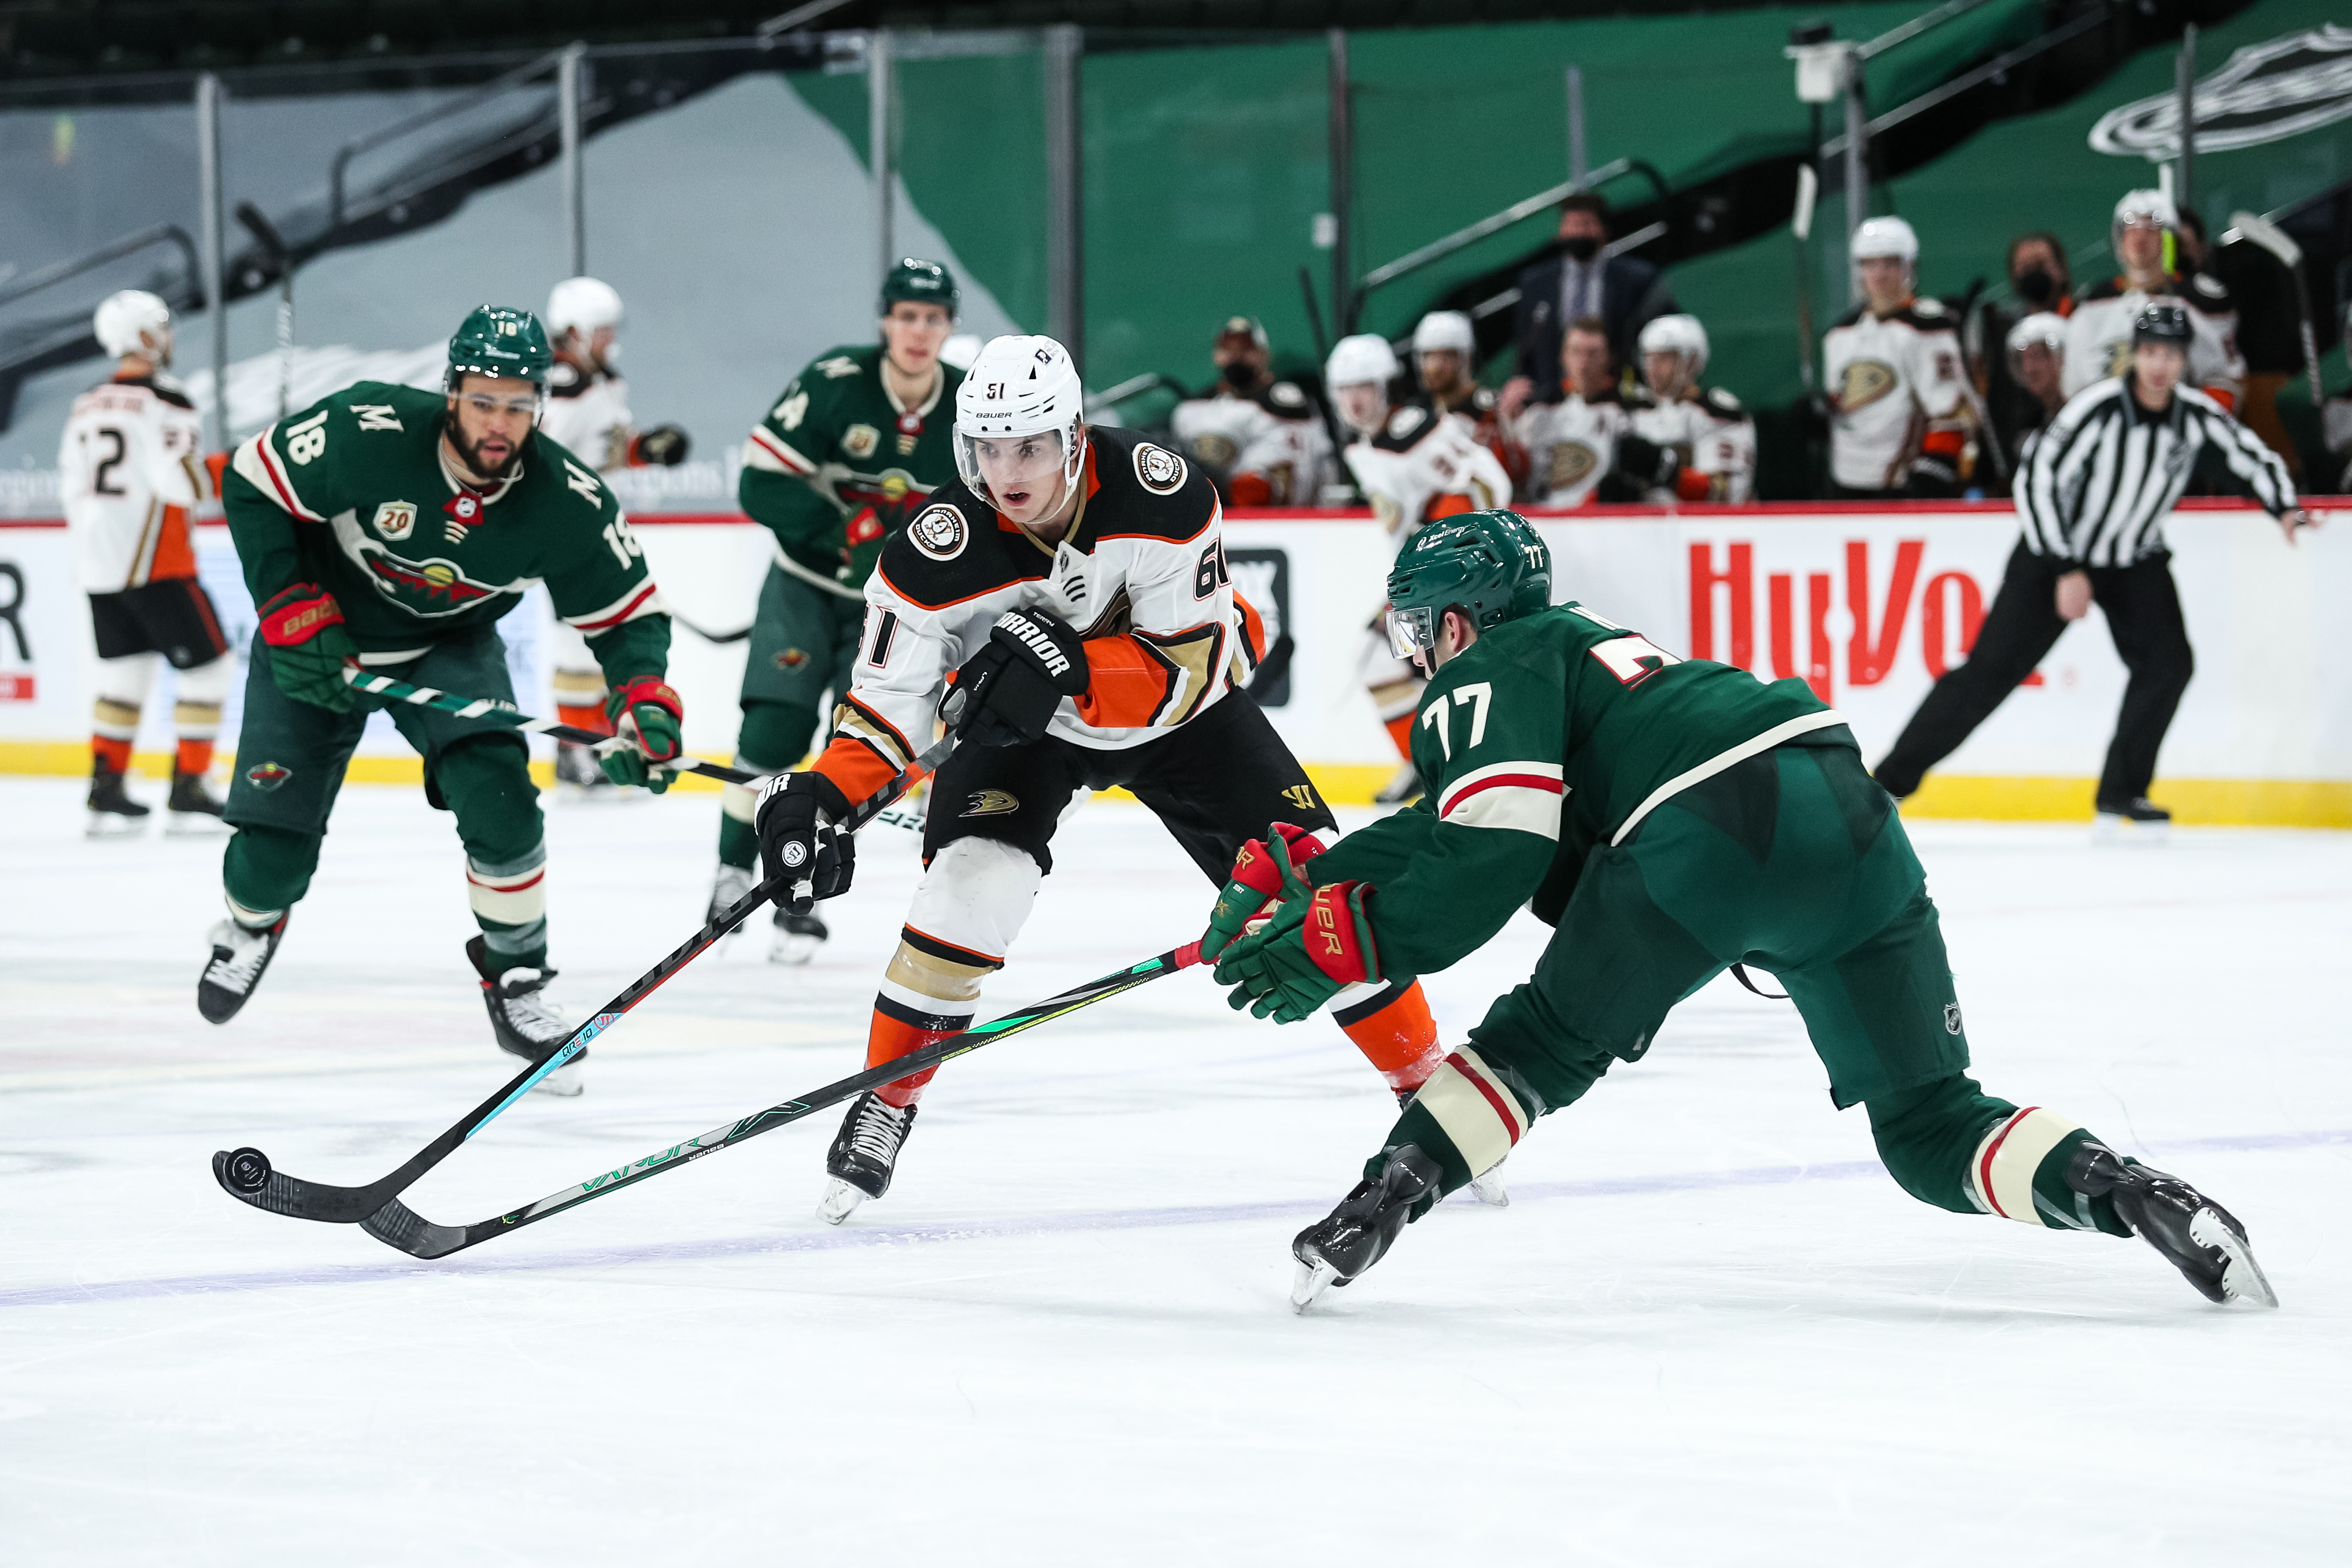 Game Preview: Minnesota Wild vs. Anaheim Ducks 3/24/21 @ 4:30PM at Xcel Energy Center